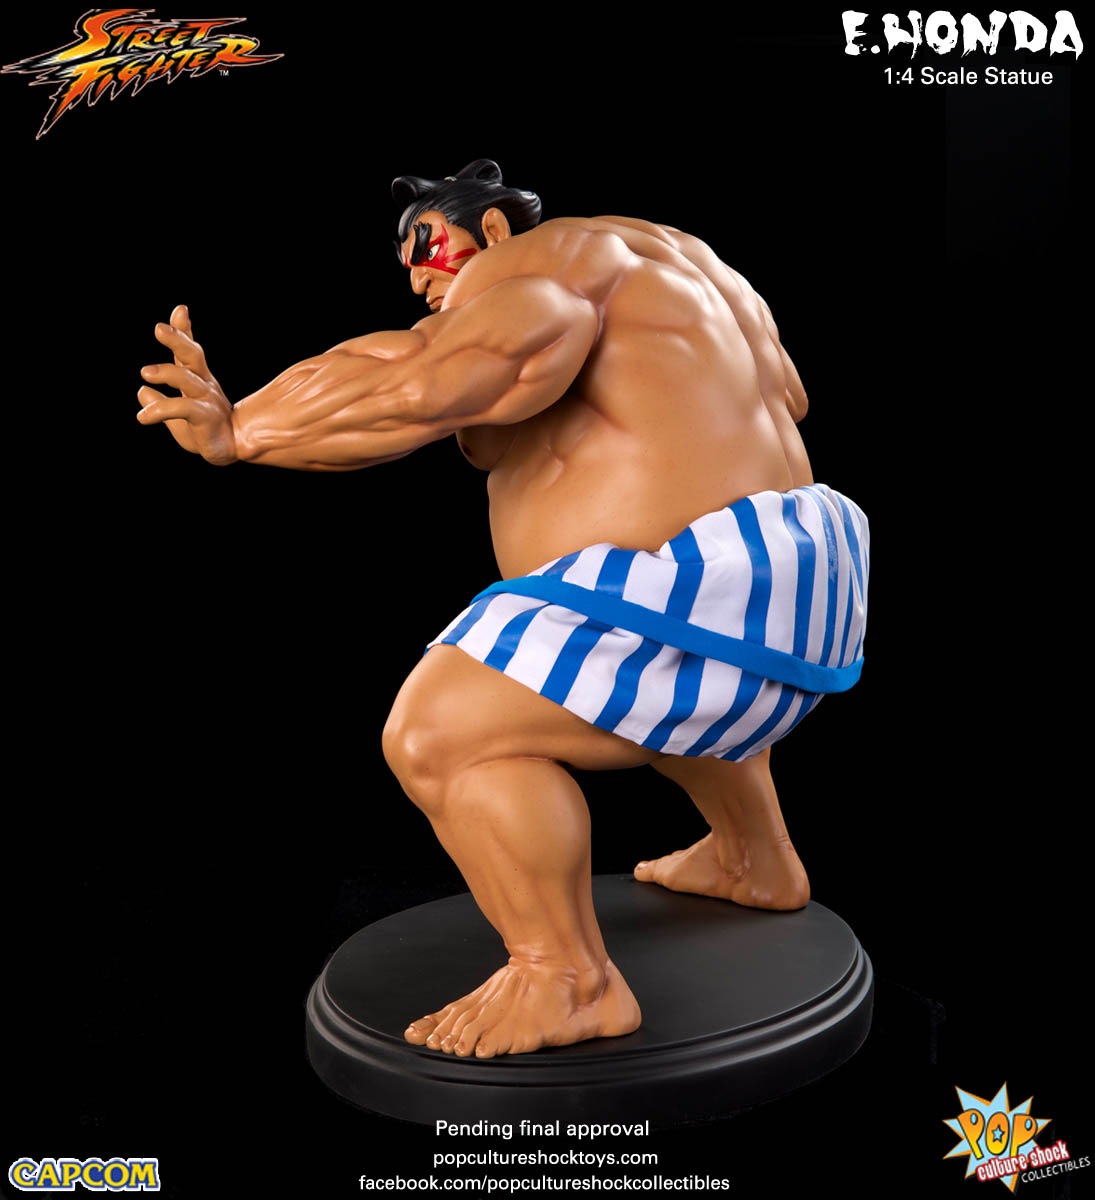 [Pop Culture Shock] Street Fighter: E. Honda 1/4 Statue - Página 3 Street-Fighter-E.-Honda-Regular-Statue-009